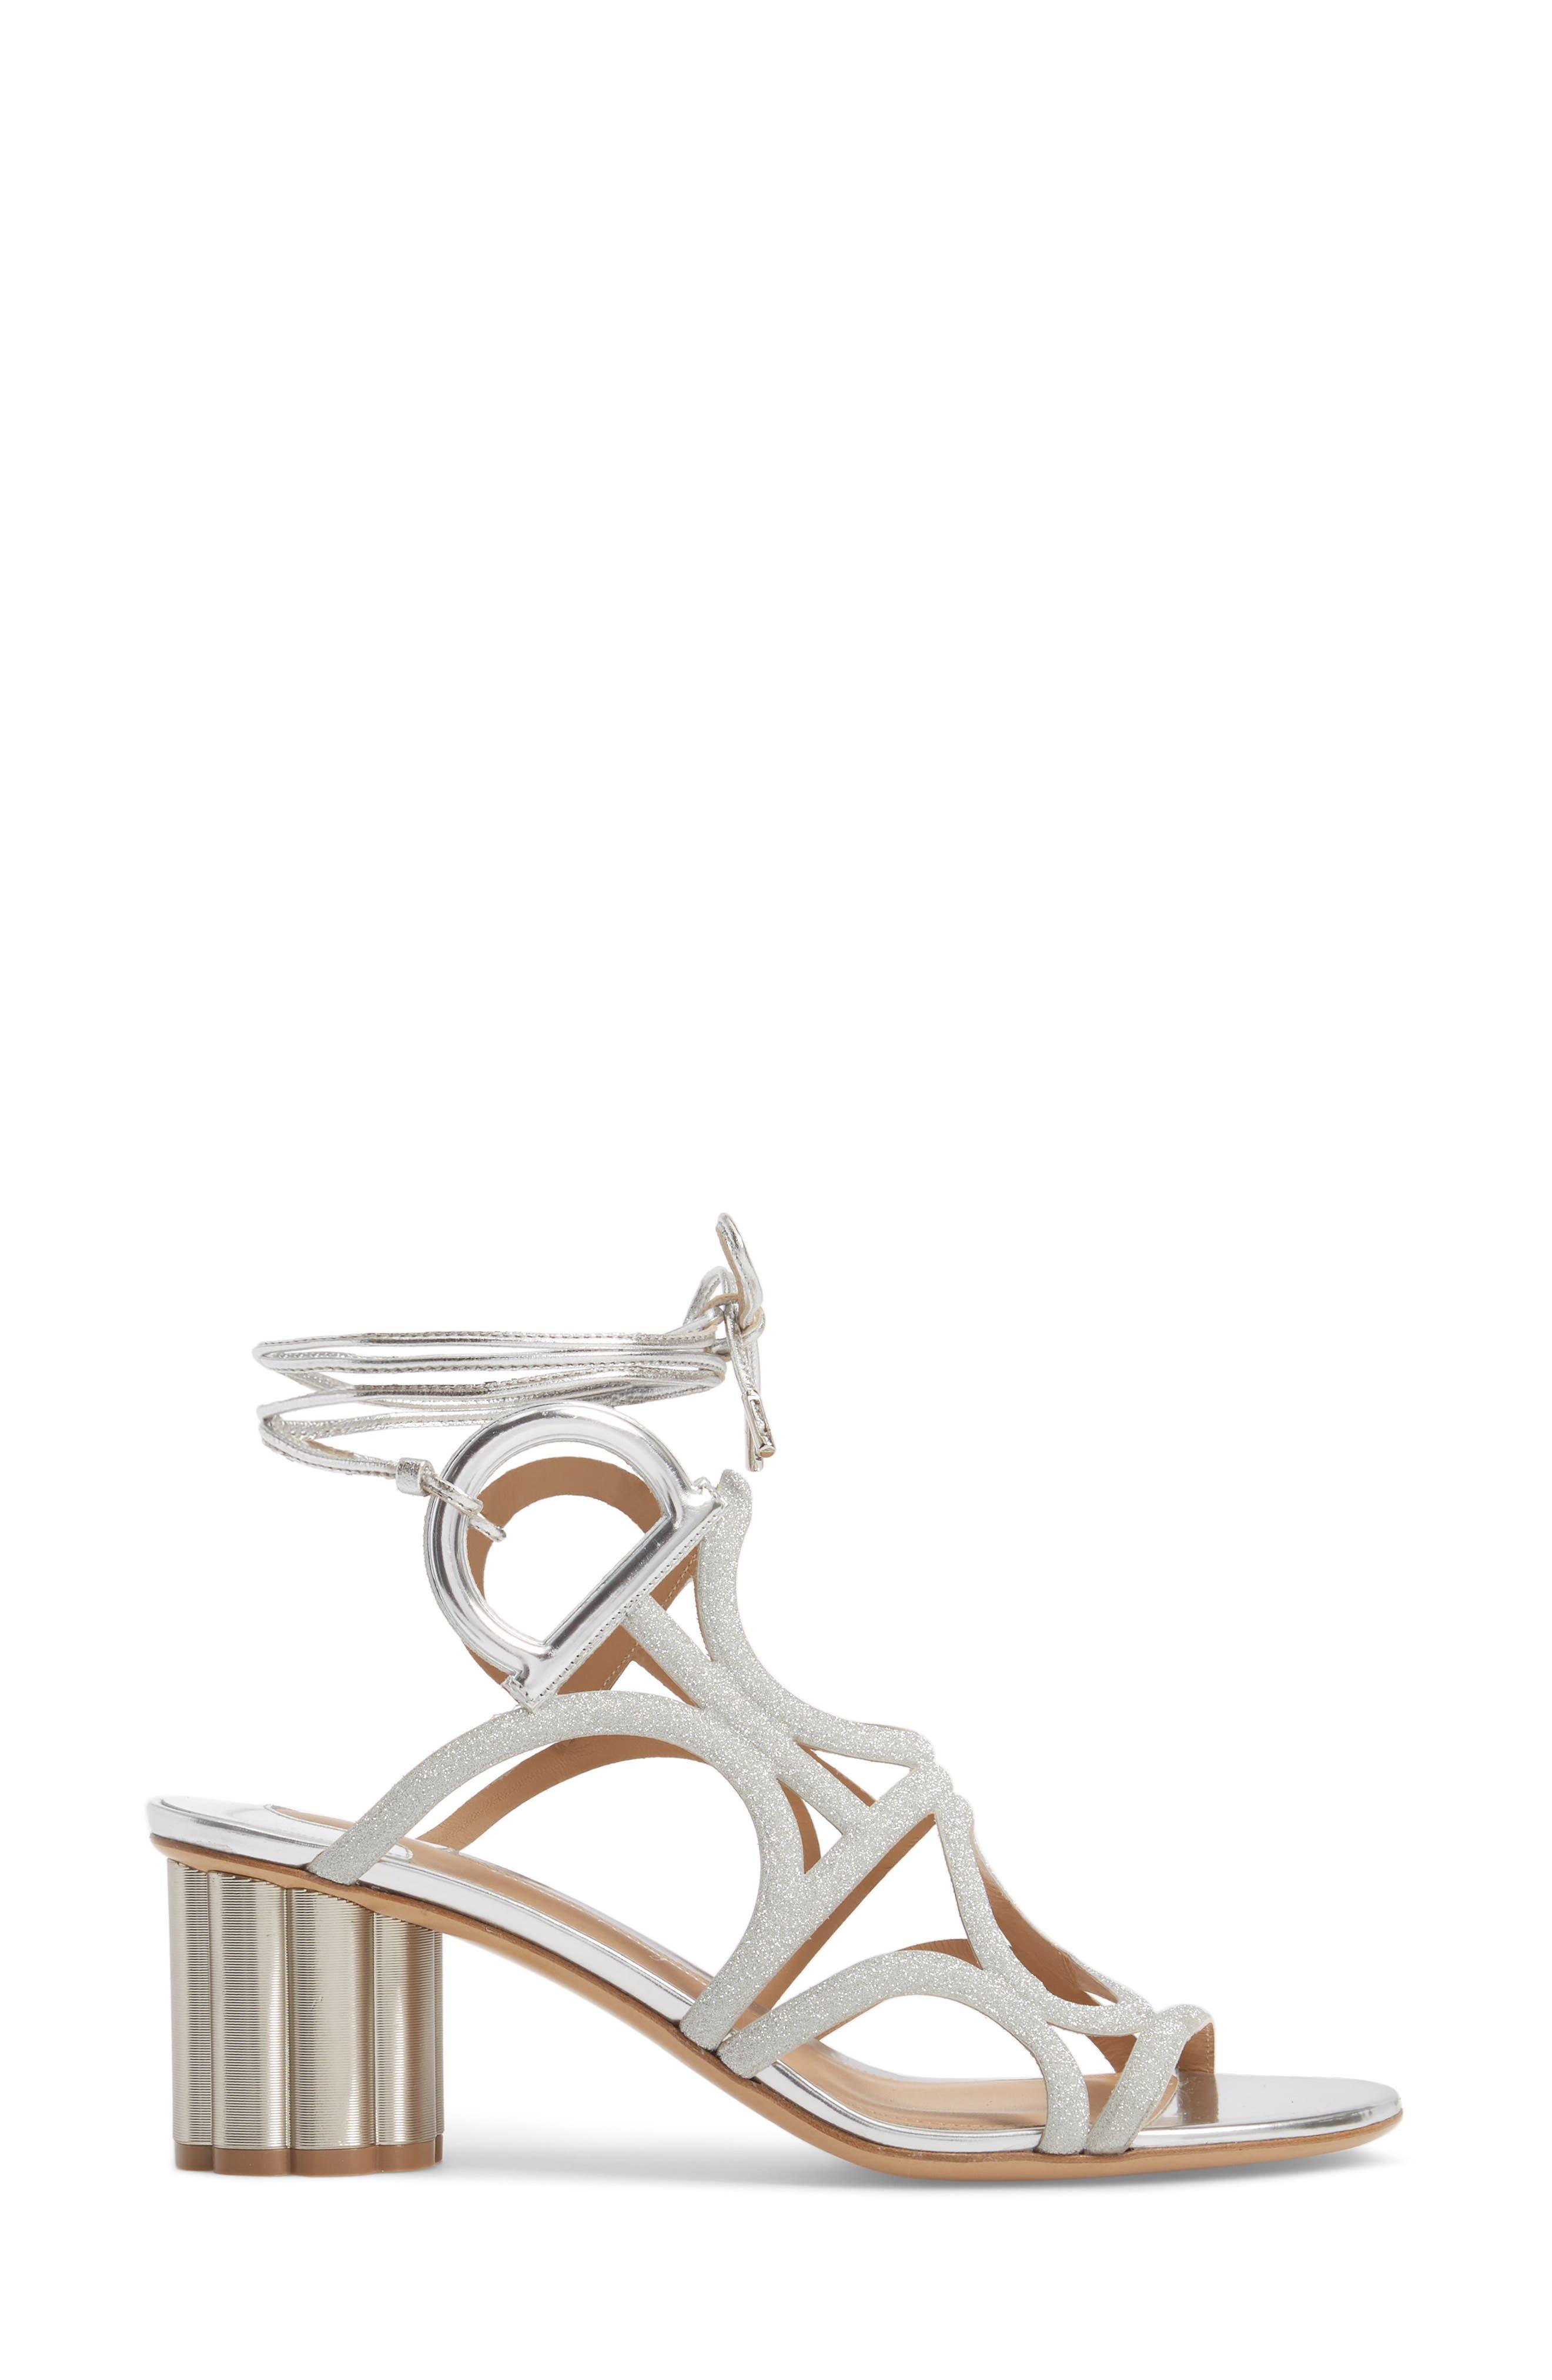 Alternate Image 3  - Salvatore Ferragamo Vinci Lace-Up Sandal (Women)